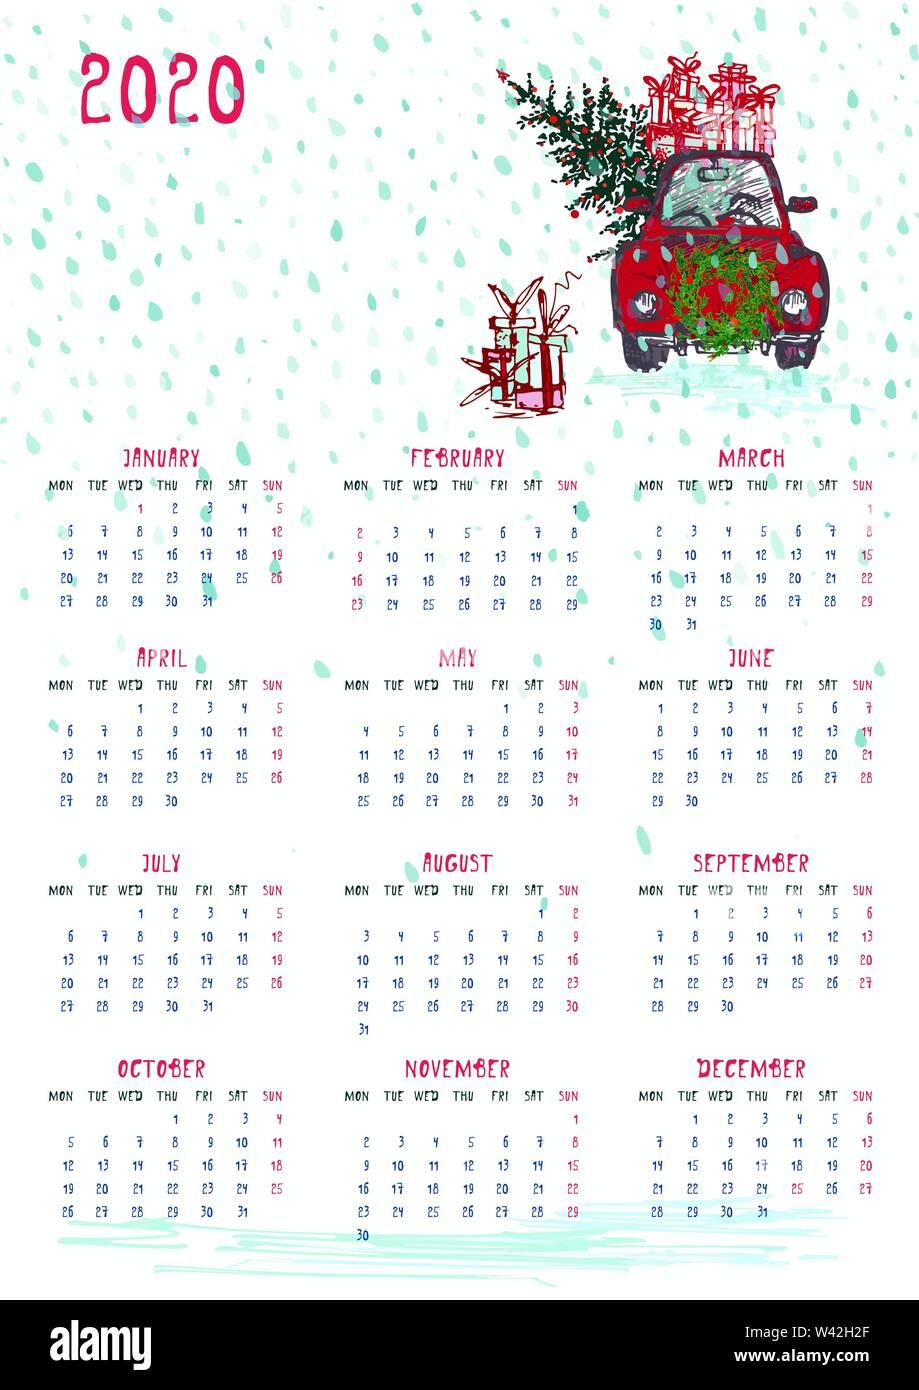 Printable Christmas Calendar 2020 2020 Calendar planner whith red christmas car, new year tree and